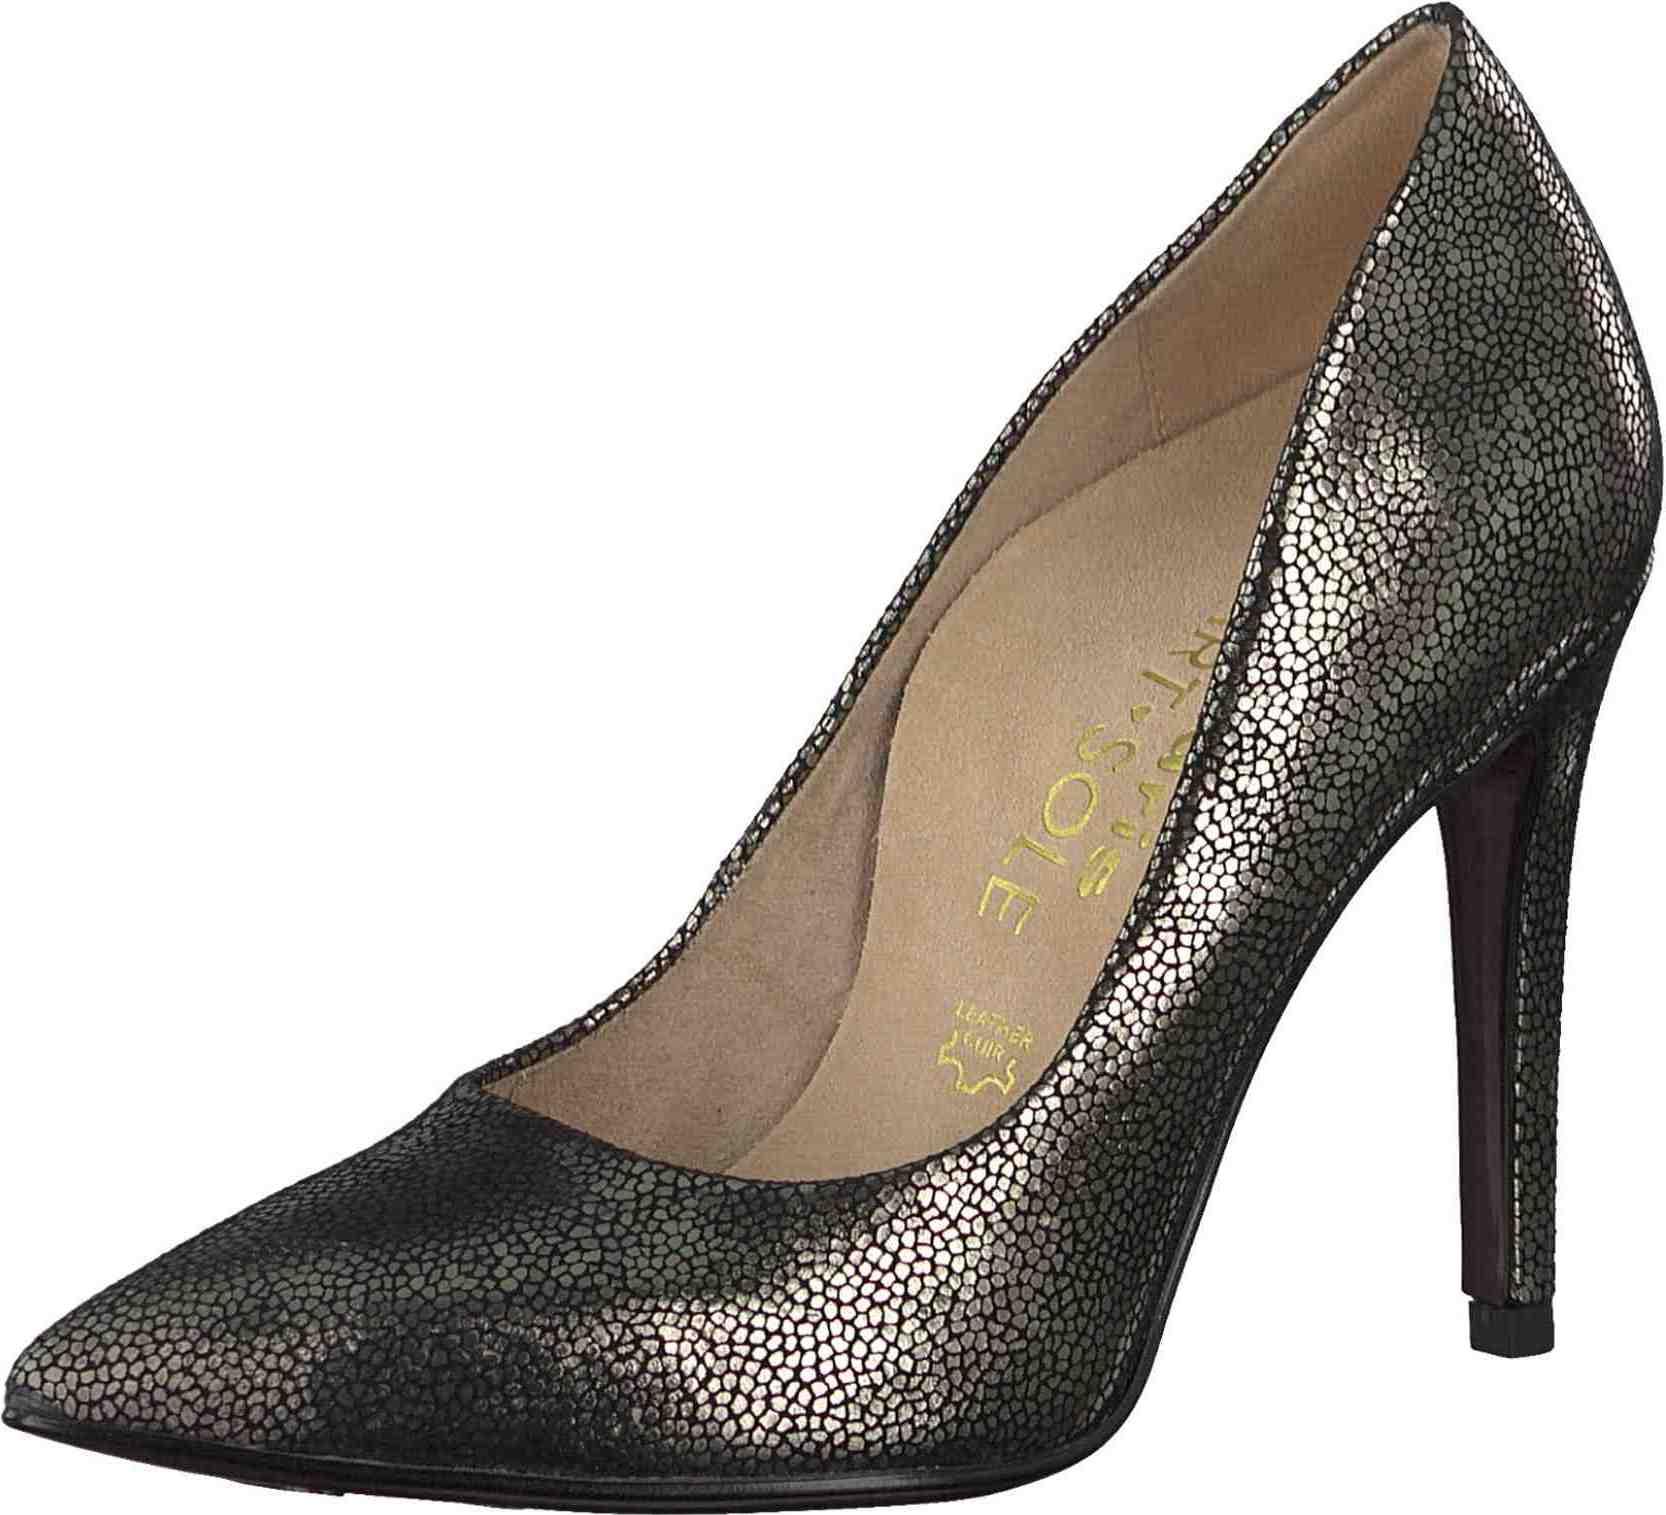 Dámská obuv TAMARIS 1-1-22439-21 BRONCE BLACK 971 – E-shop Tamaris e8ab285648